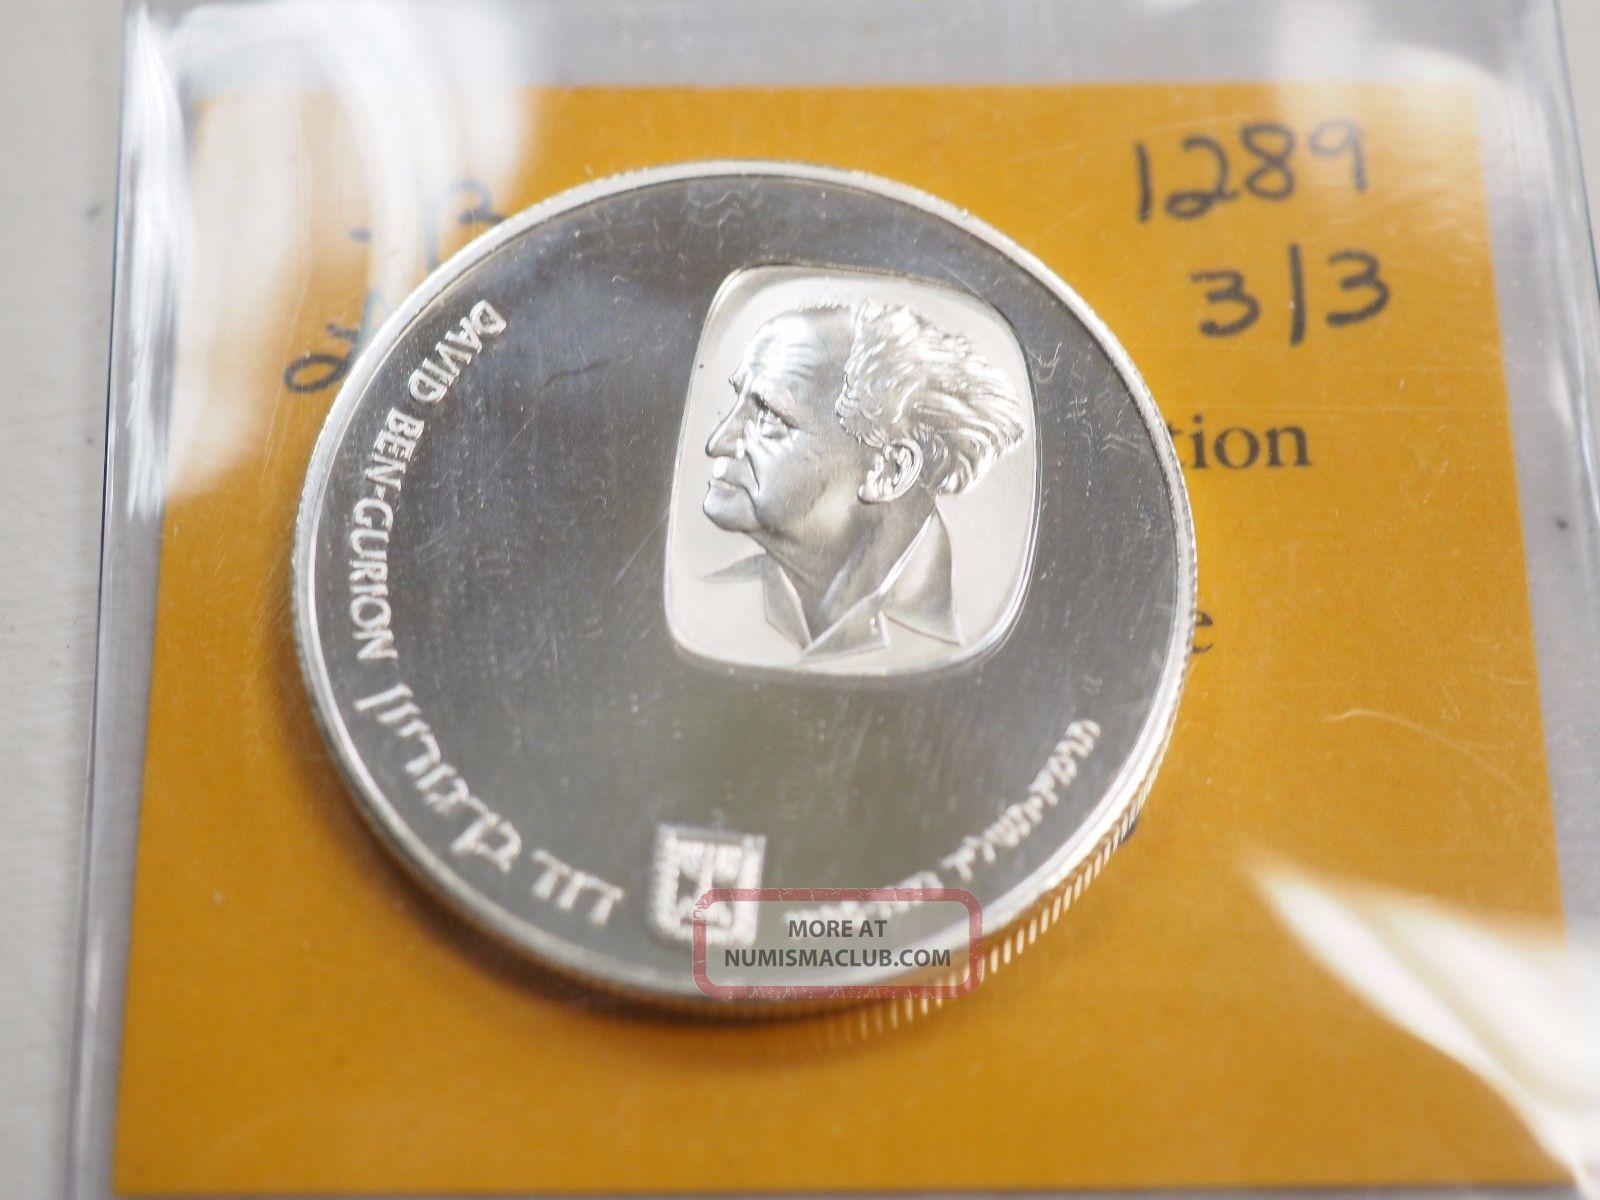 1974 Israel David Ben - Gurion Silver Proof 25 Lirot Middle East photo